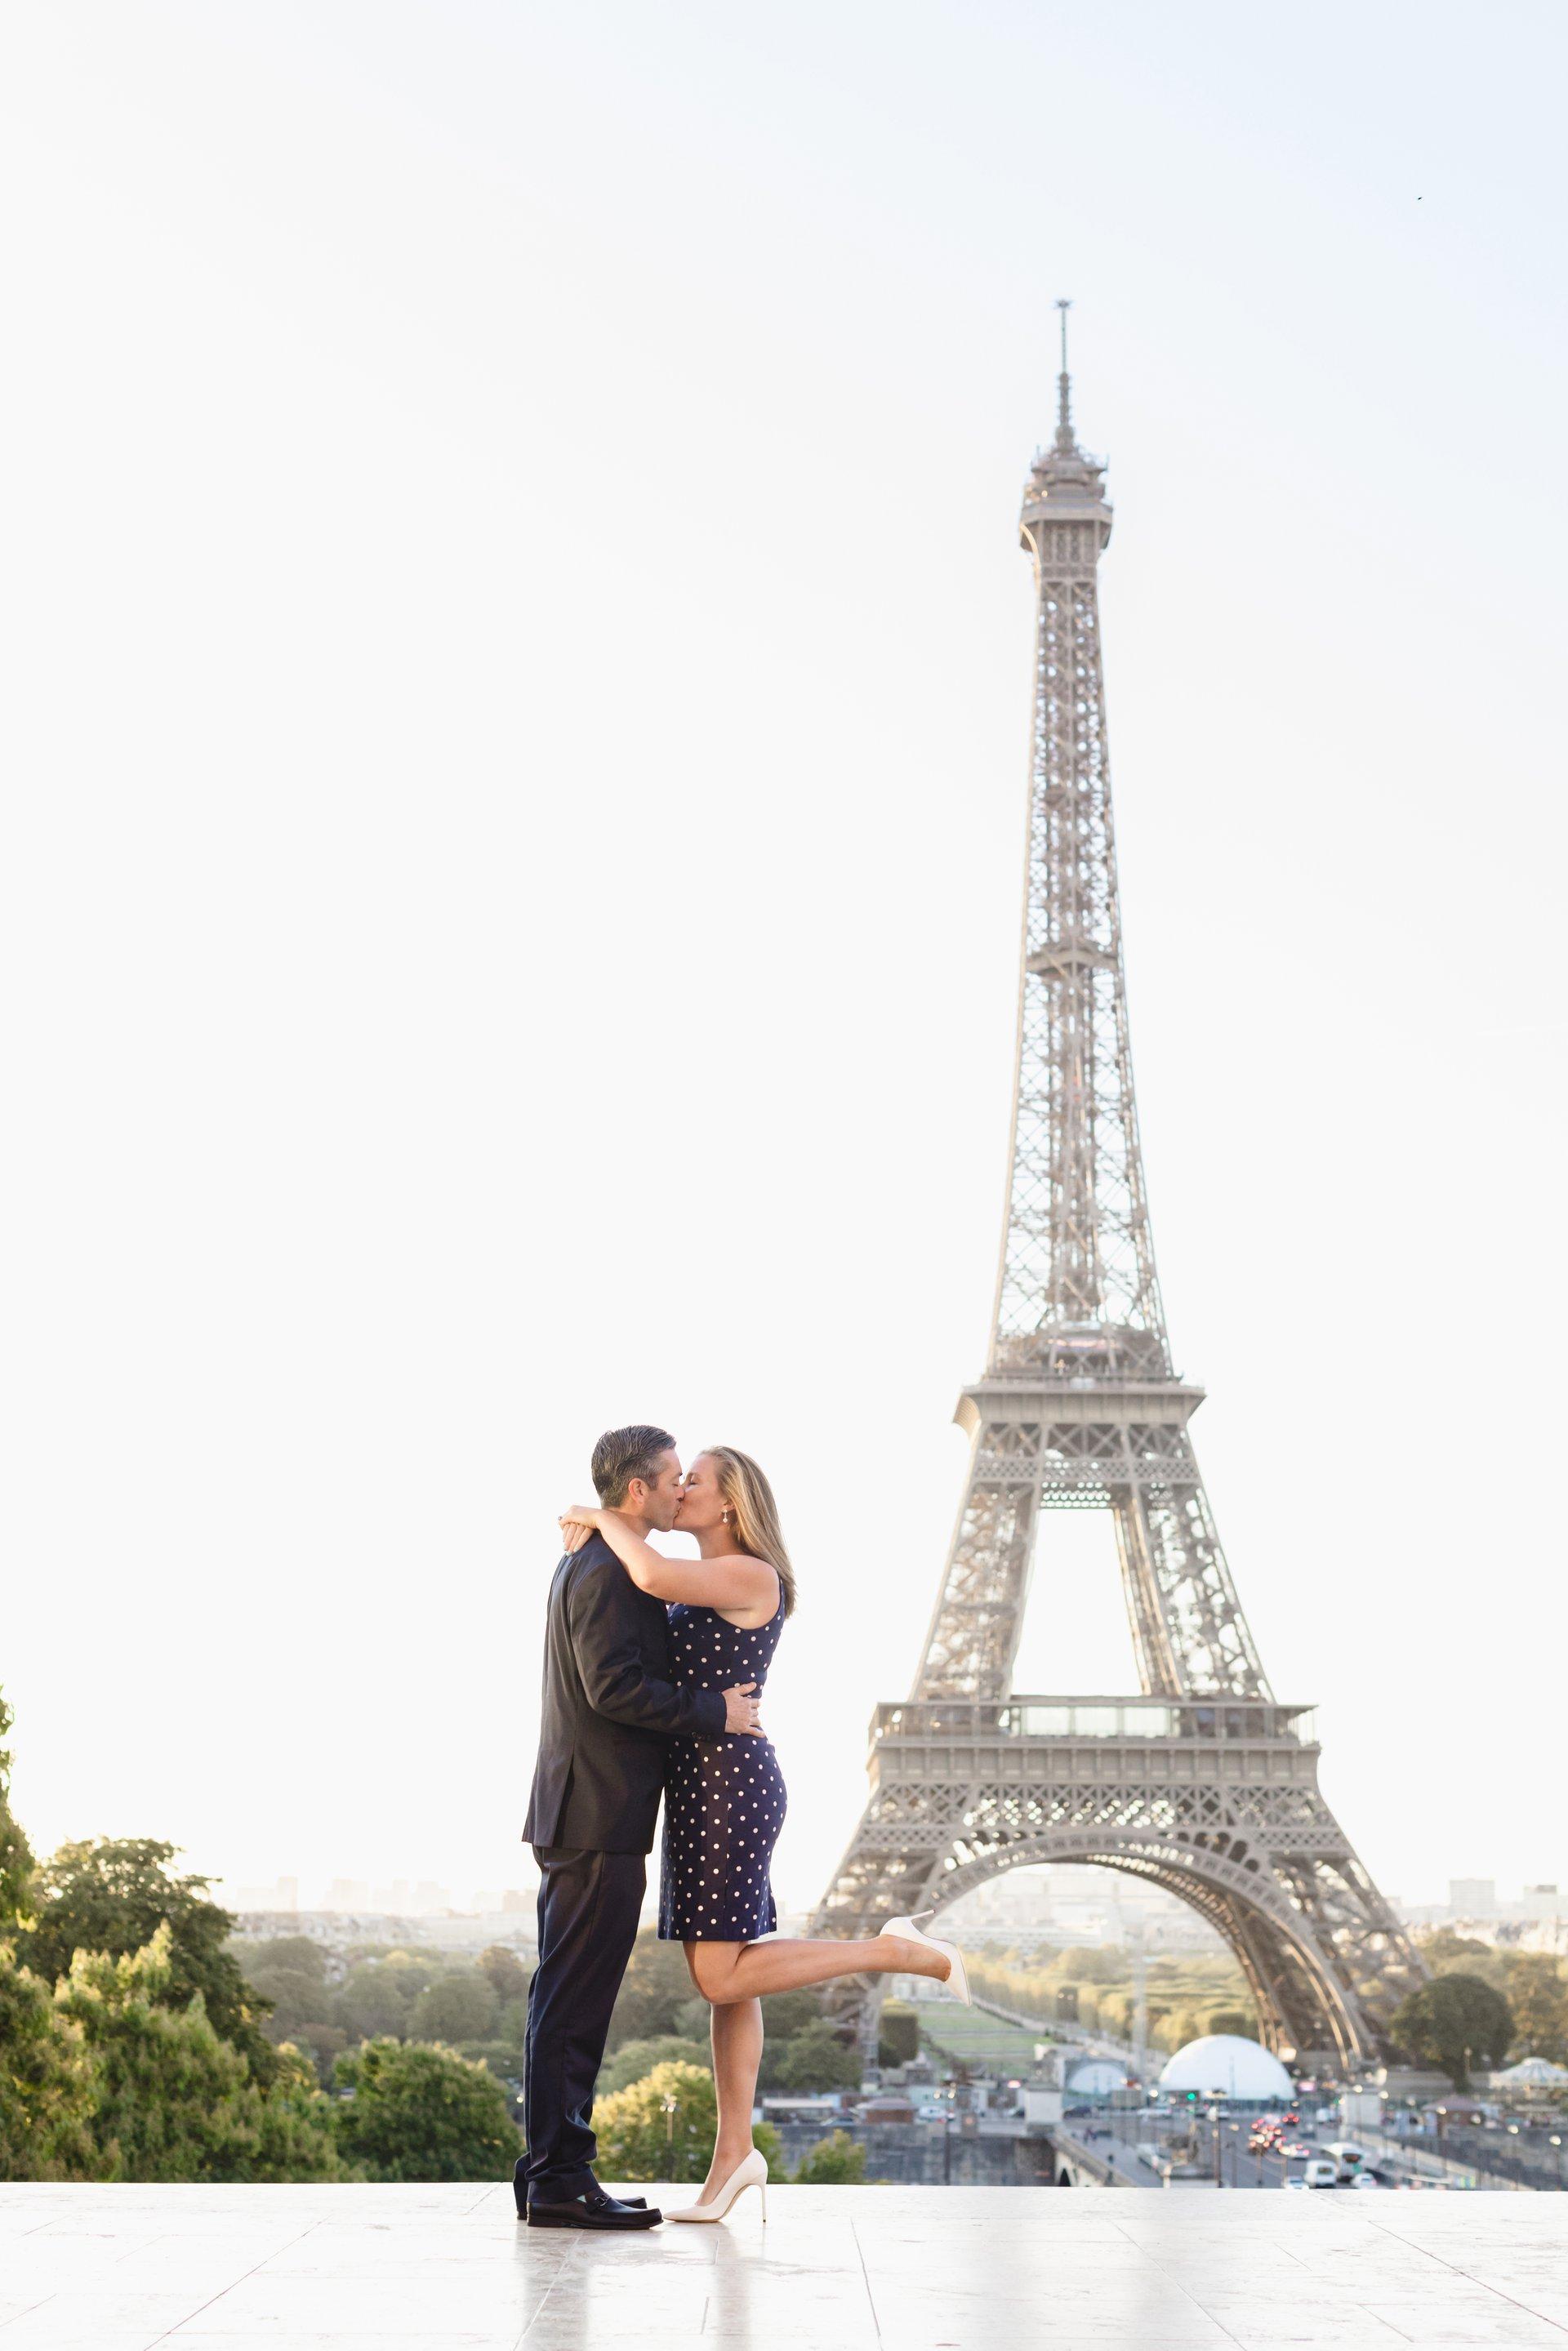 Paris-France-travel-story-Flytographer-3